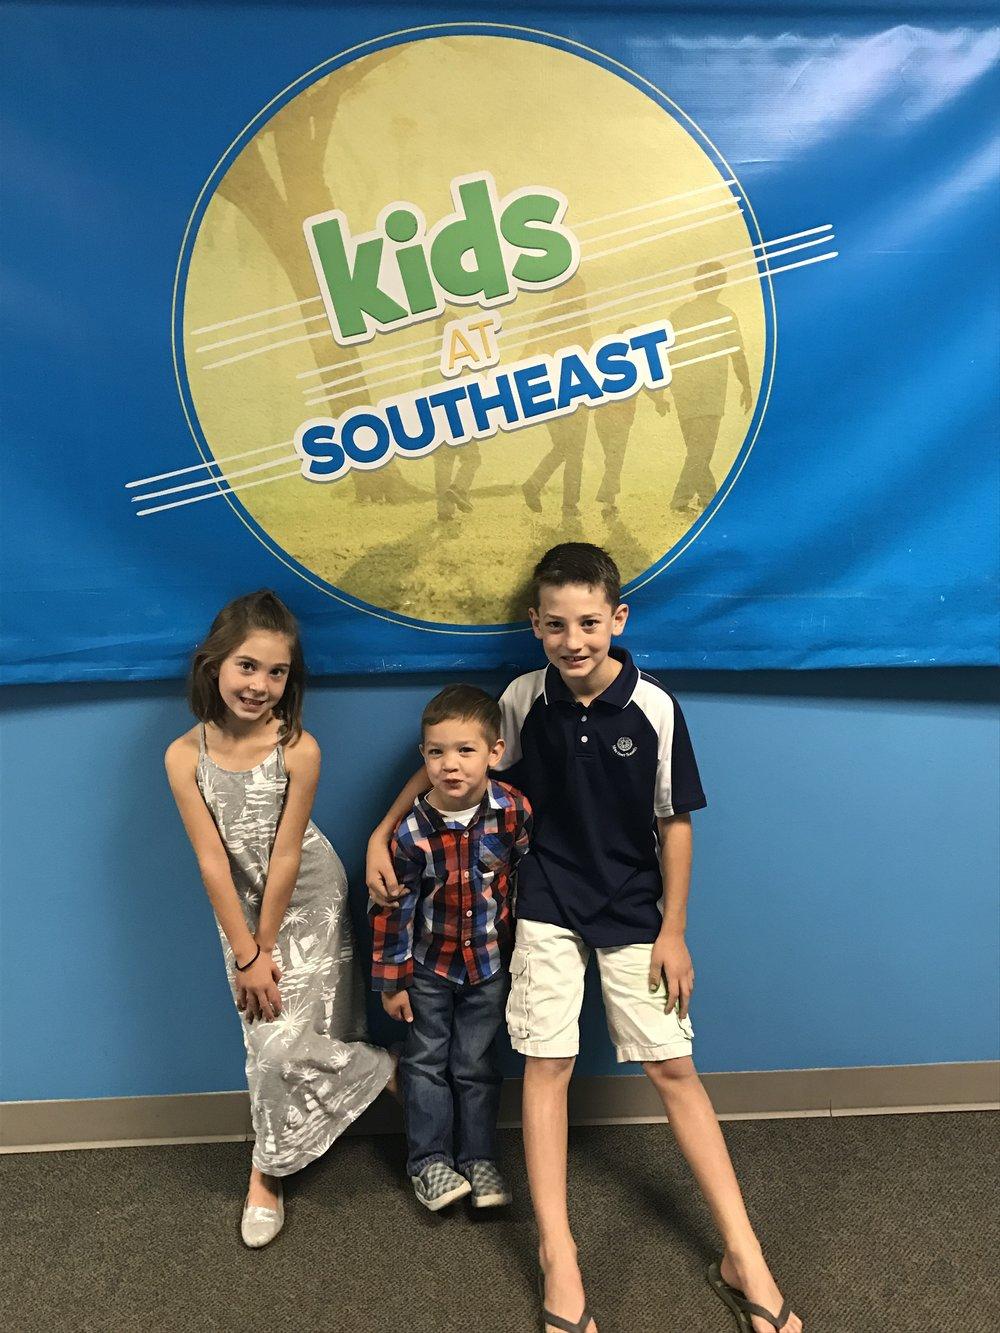 Stephanie Clarkson's Kiddos Showing Southeast Pride